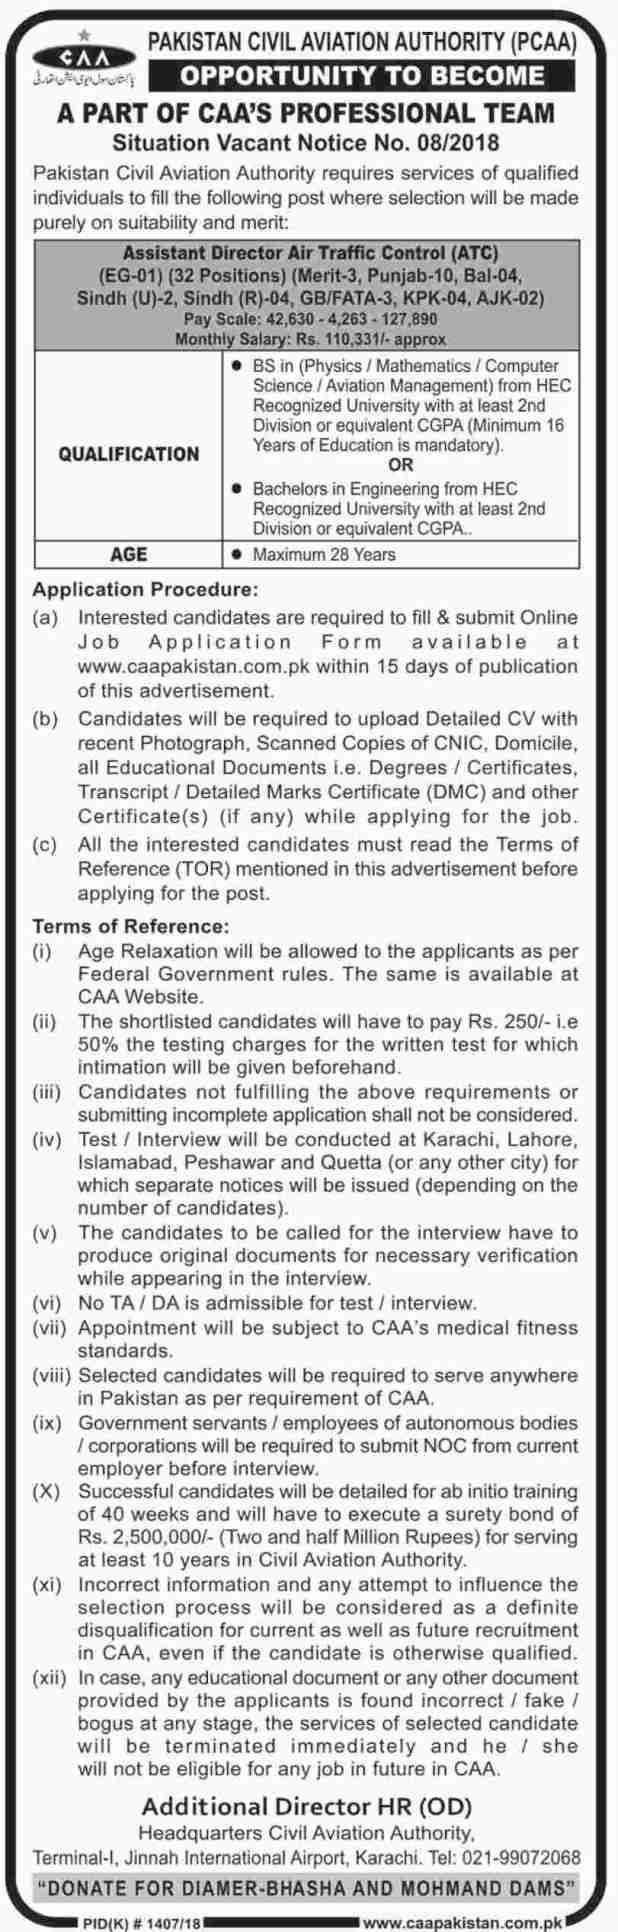 CAA Civil Aviation Authority Pakistan Jobs 2018 Qualification Experience